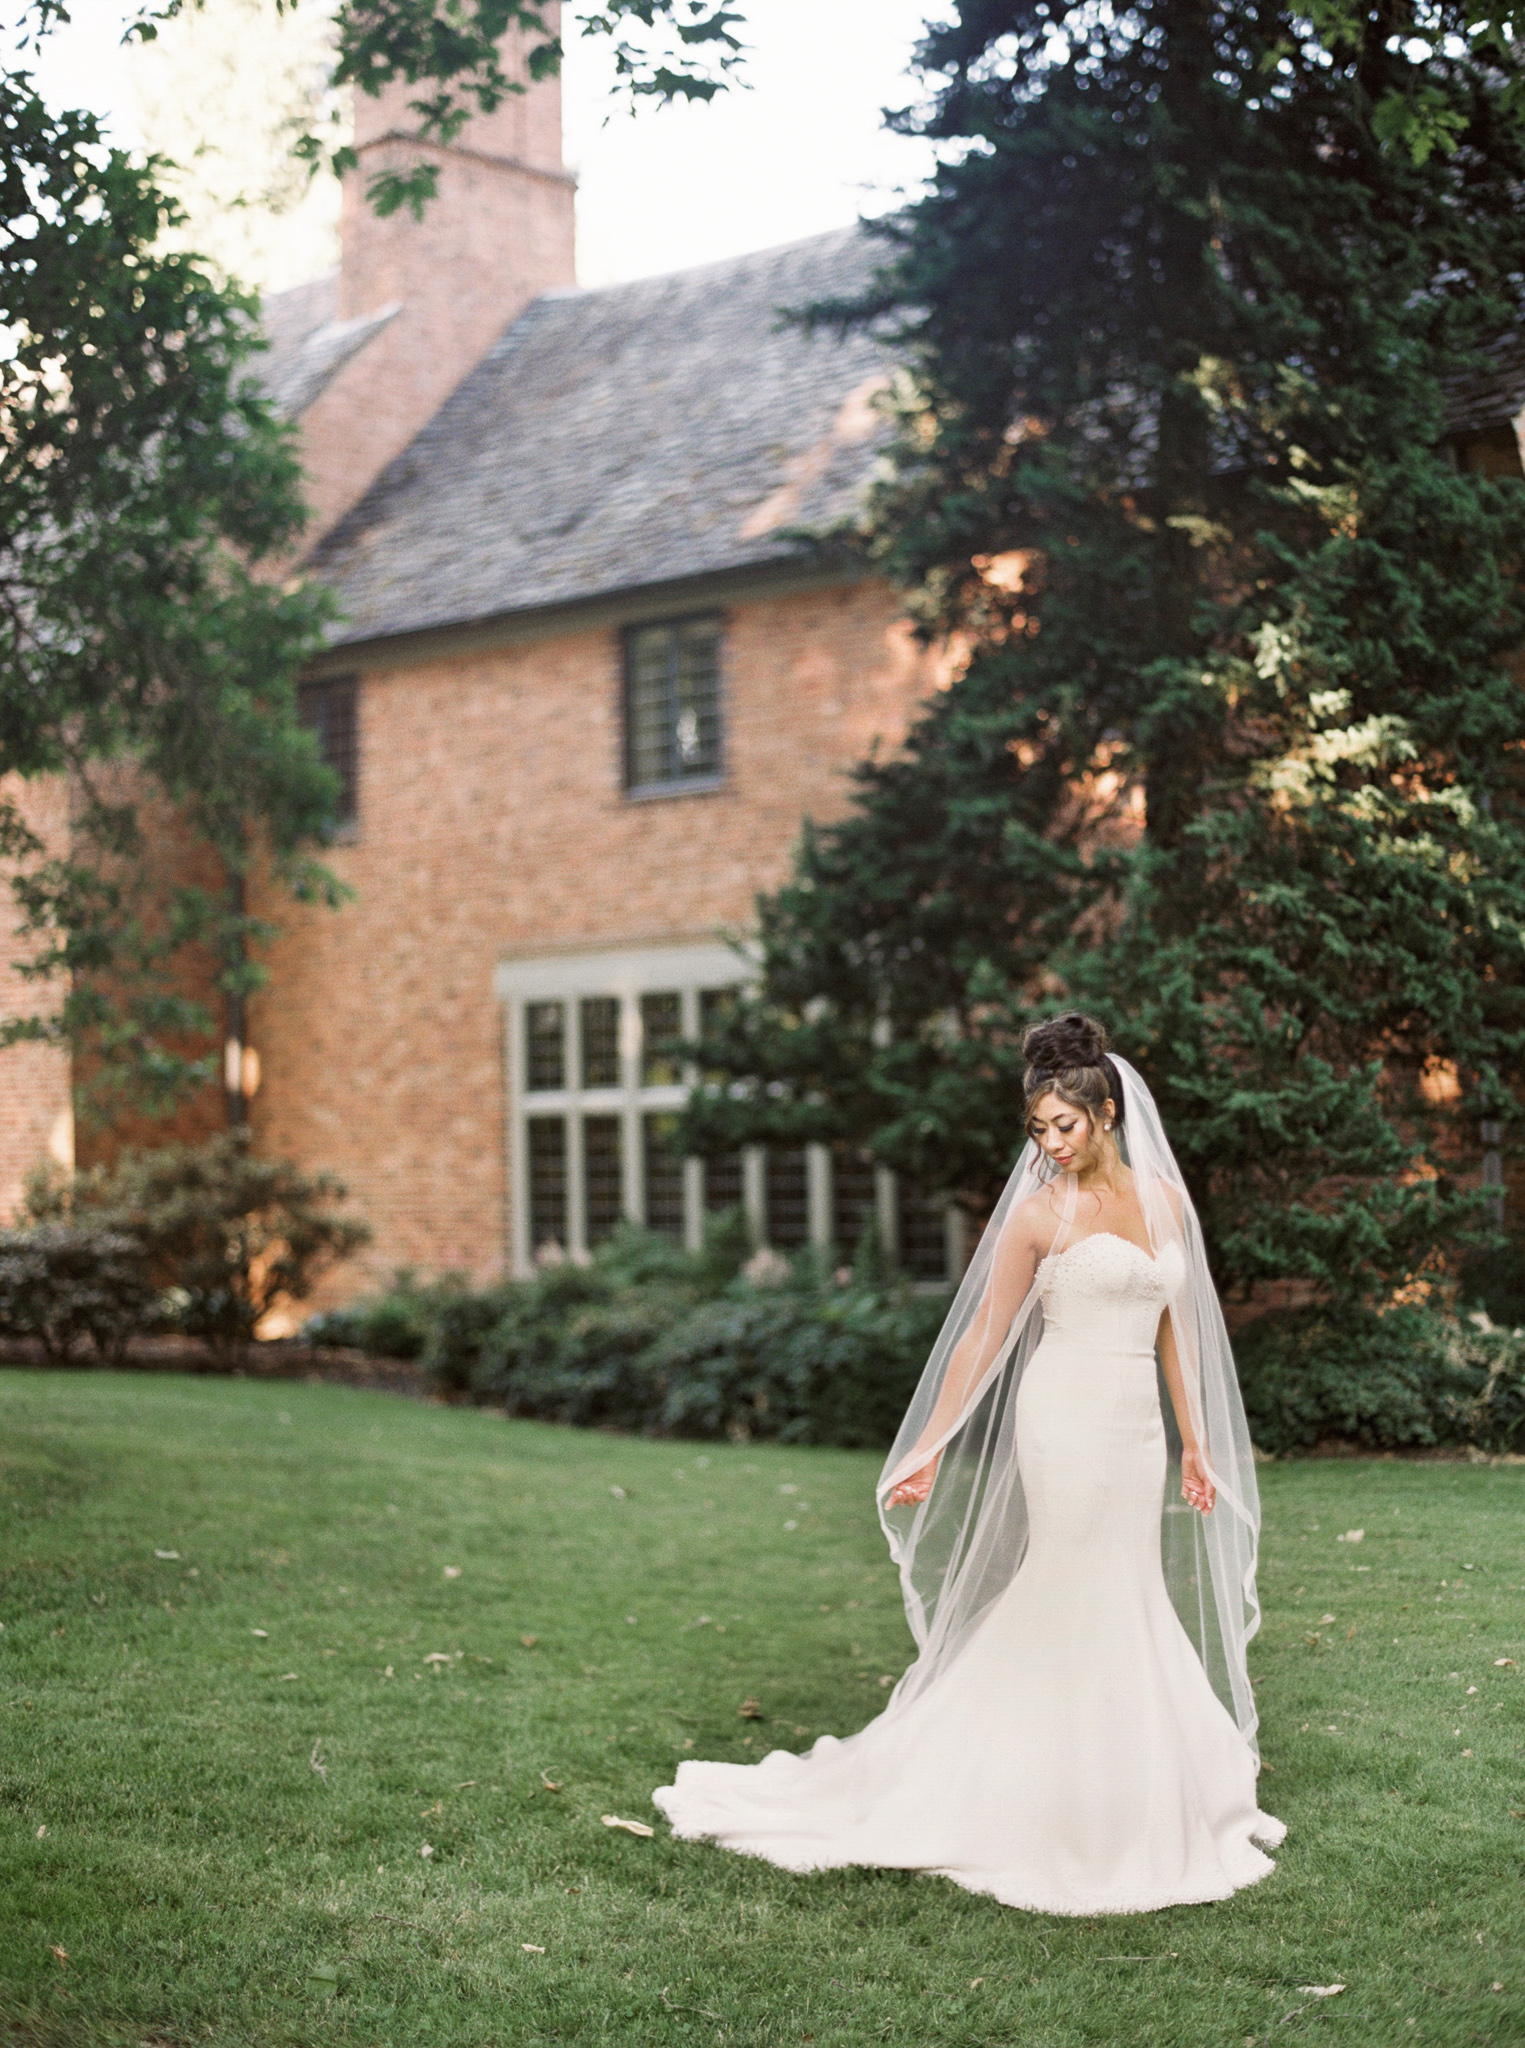 095OutliveCreative_Travel_Photographer_Videographer_Lewis&Clark_Oregon_Elegant_BlackTie_Destination_Wedding.jpg